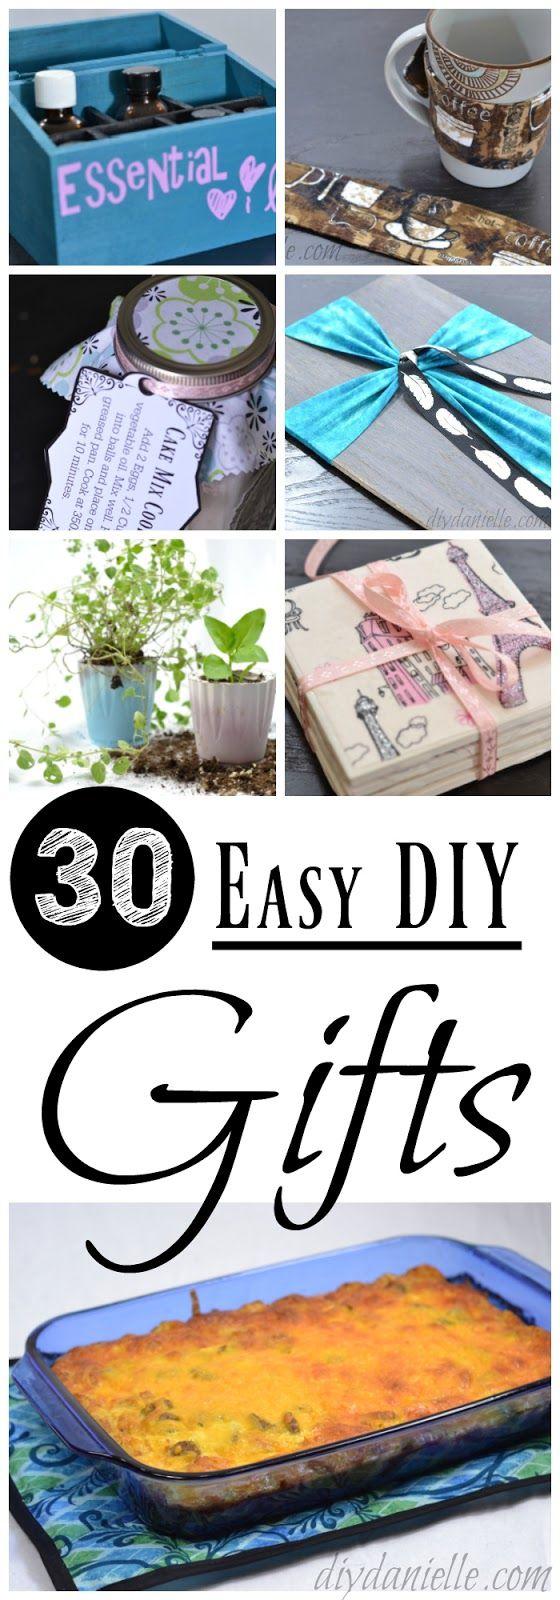 grab  go easy diy gift series  diy danielle®  easy diy